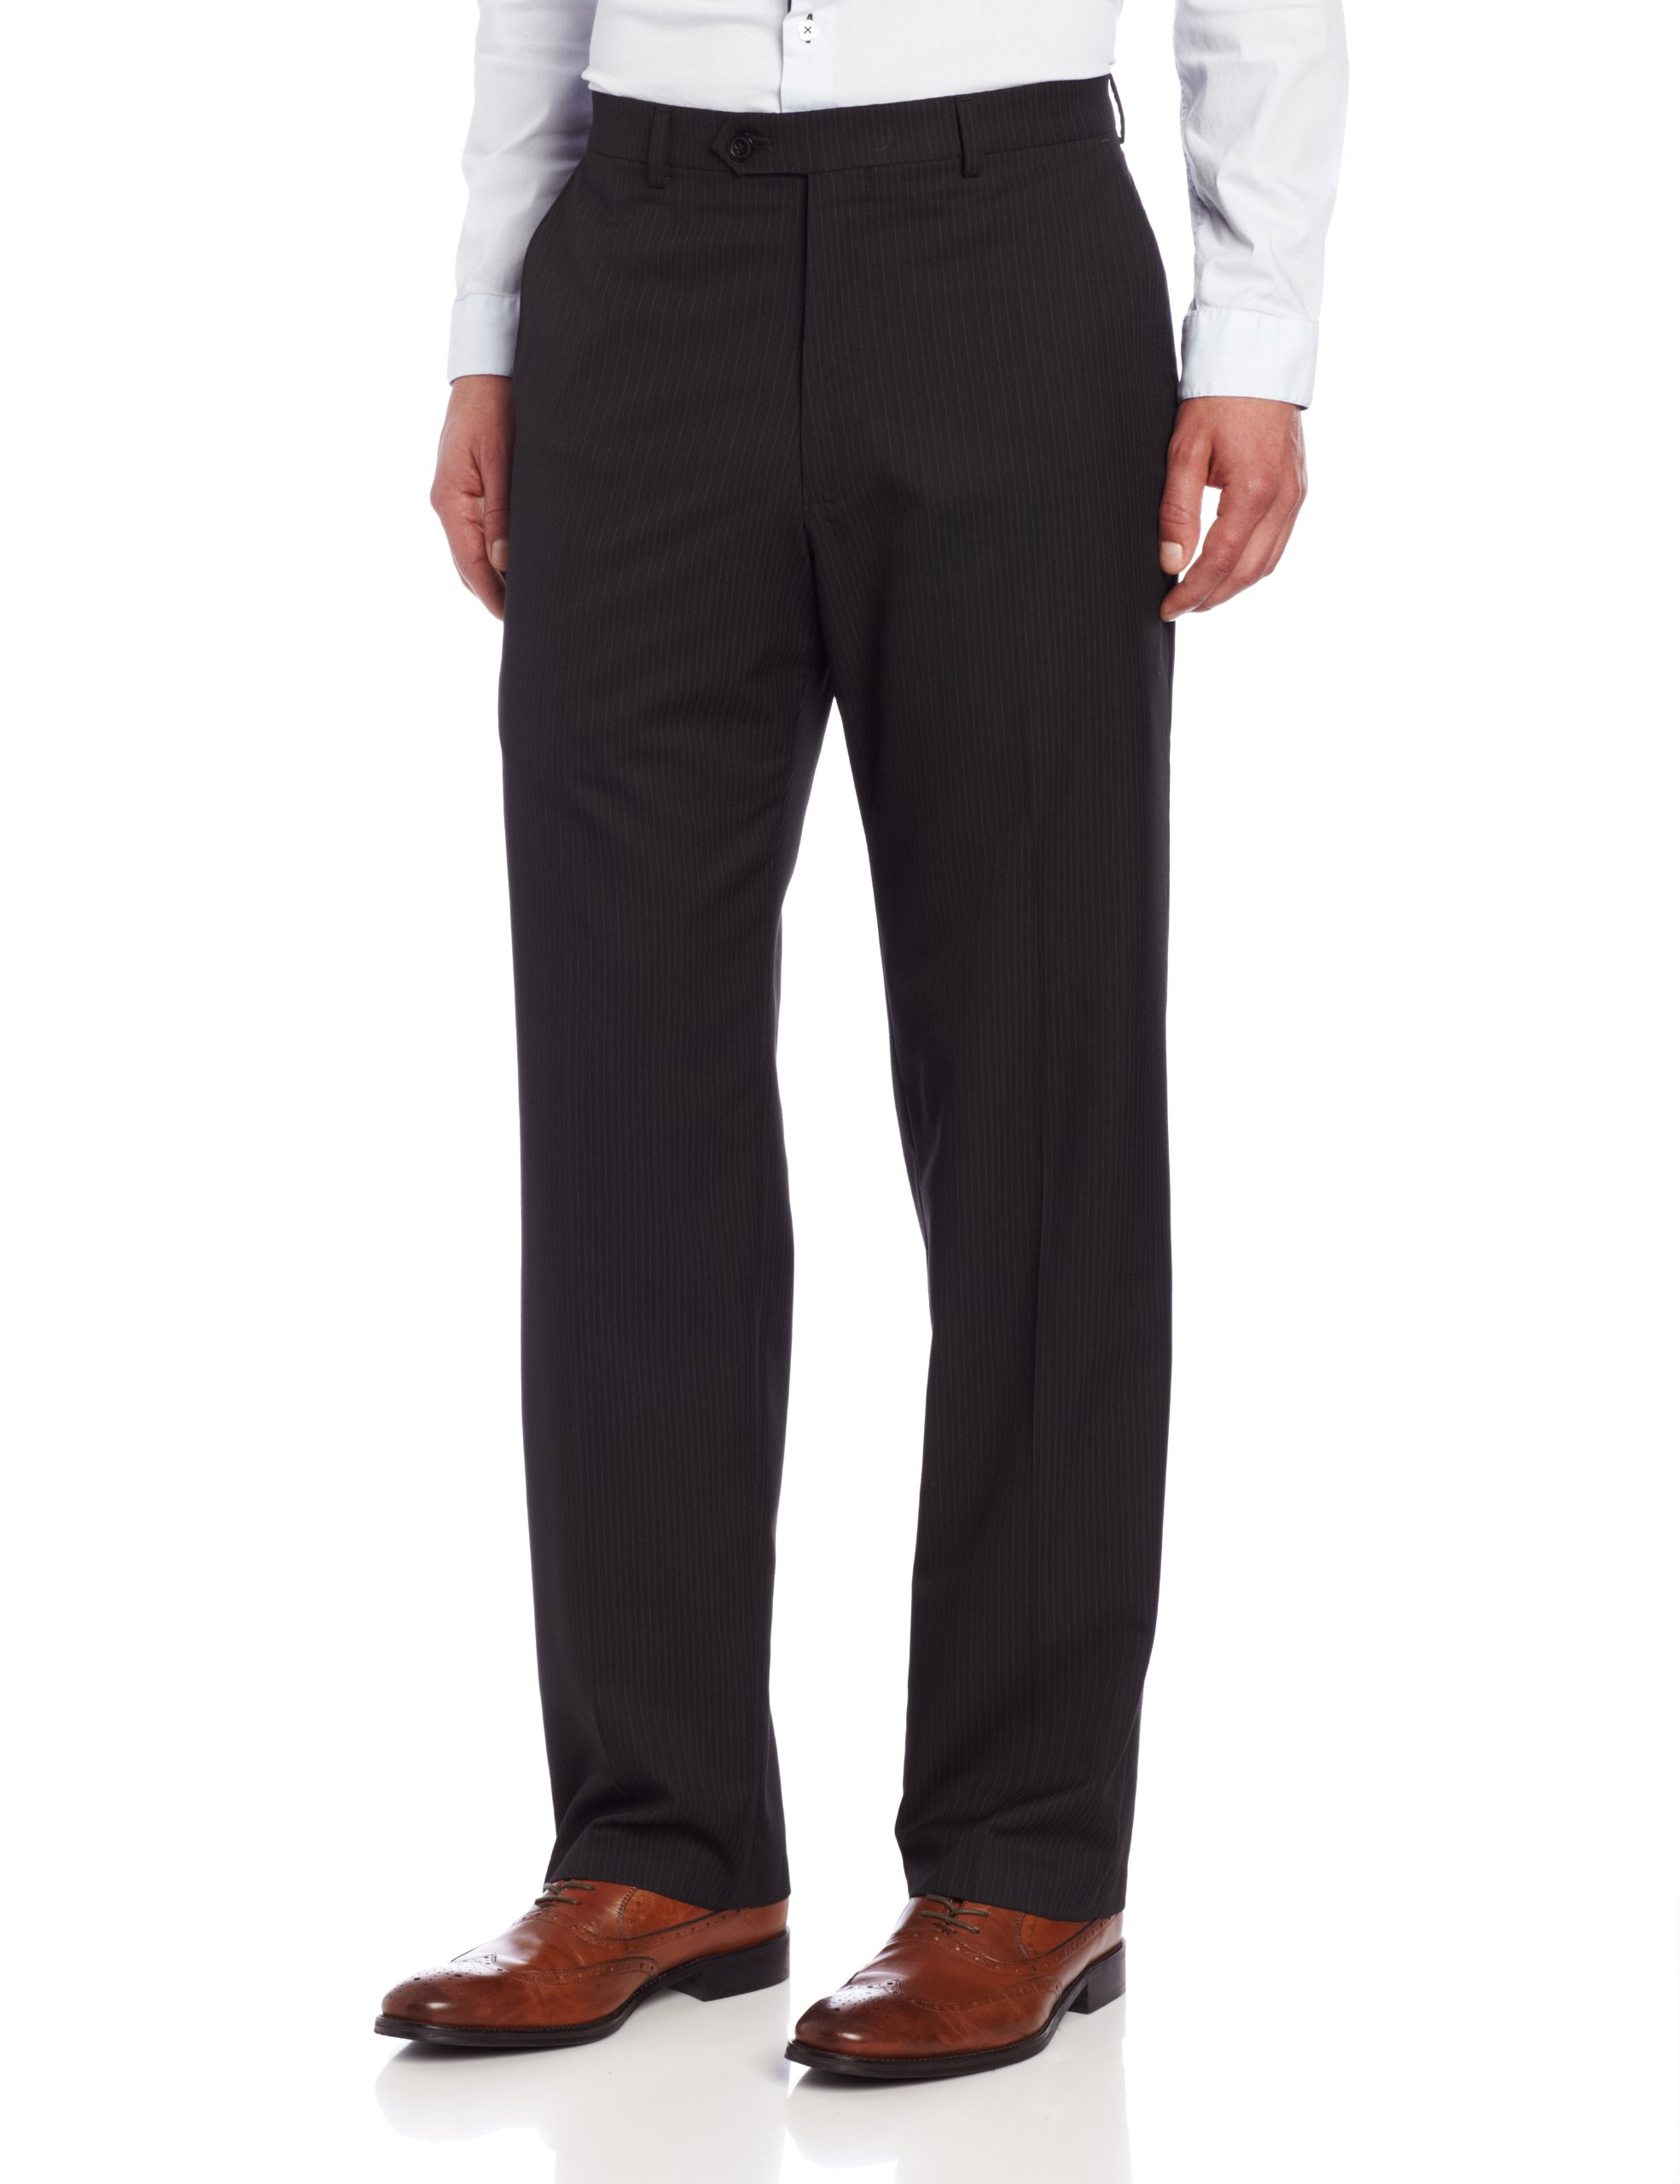 Haggar Mens Multi Bead Stripe Plain Front Suit Pant, Black, 32/32